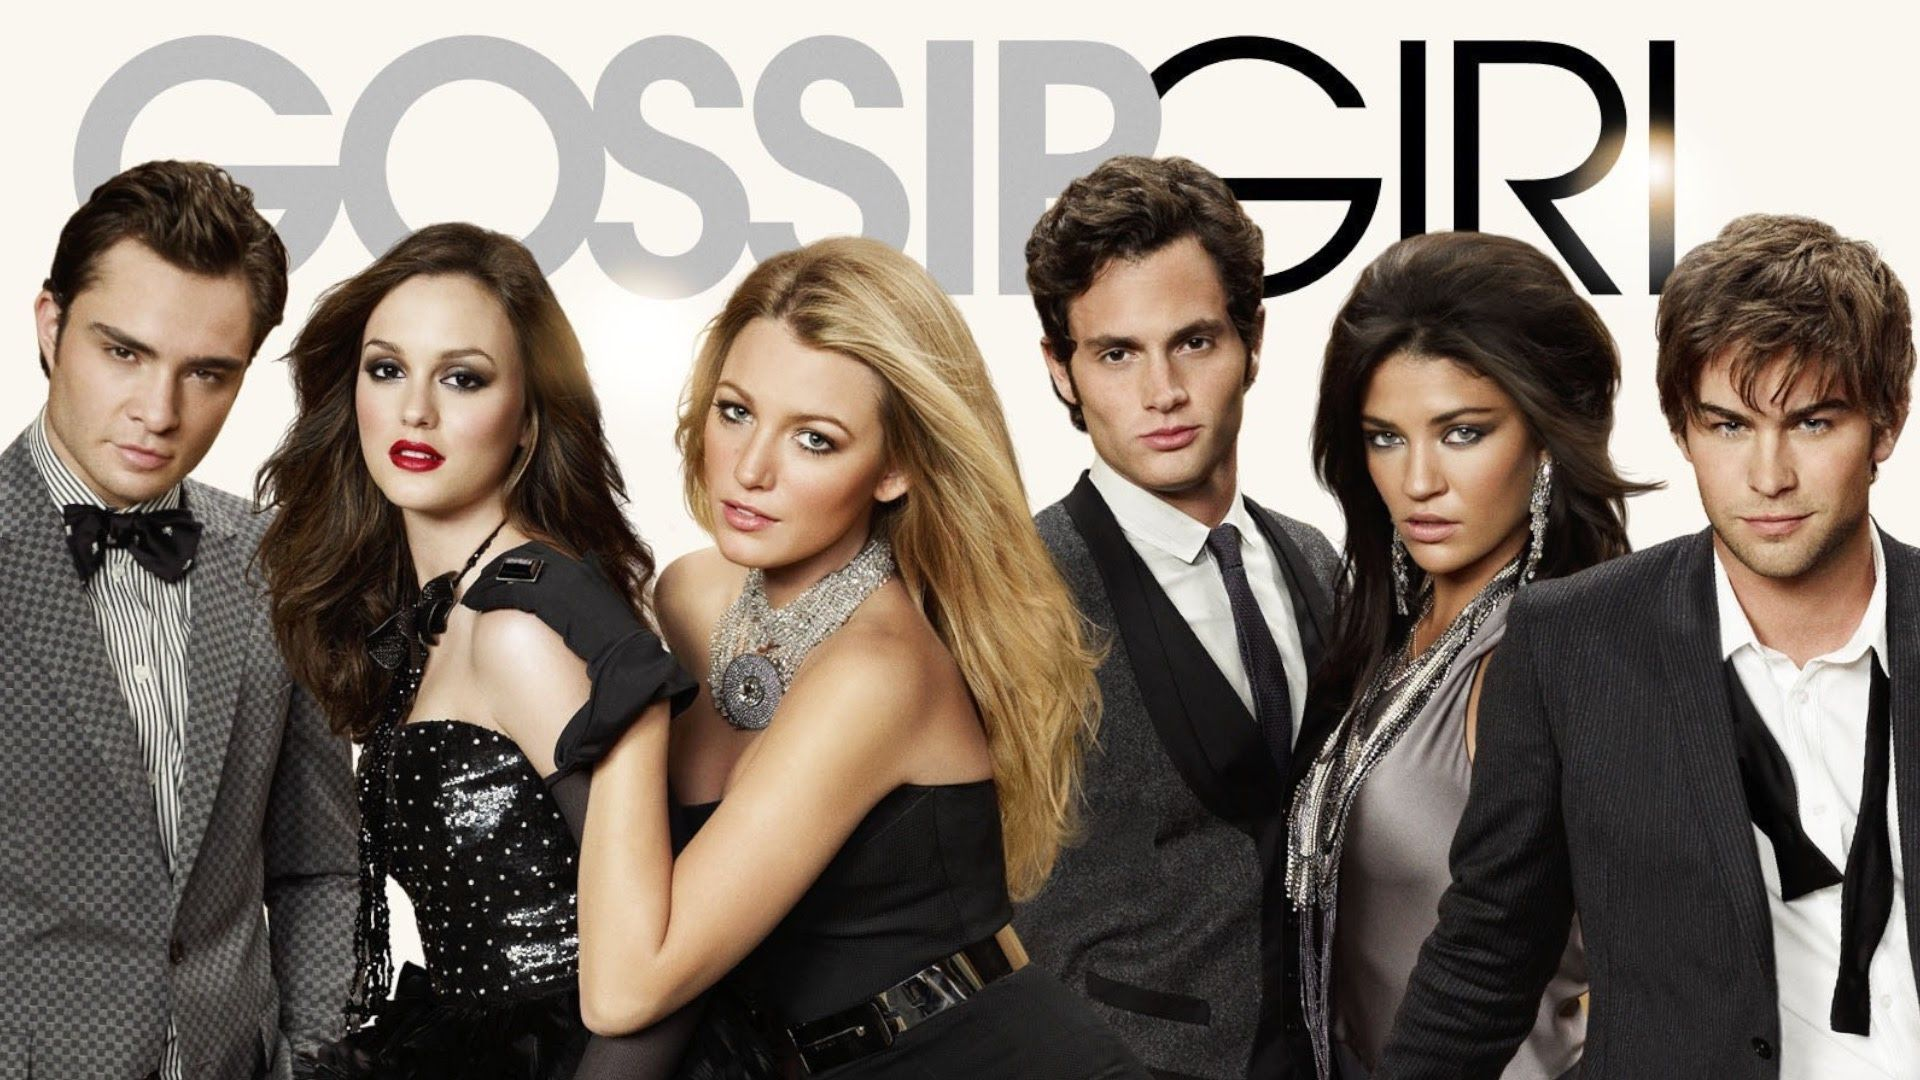 Gossip girl revival